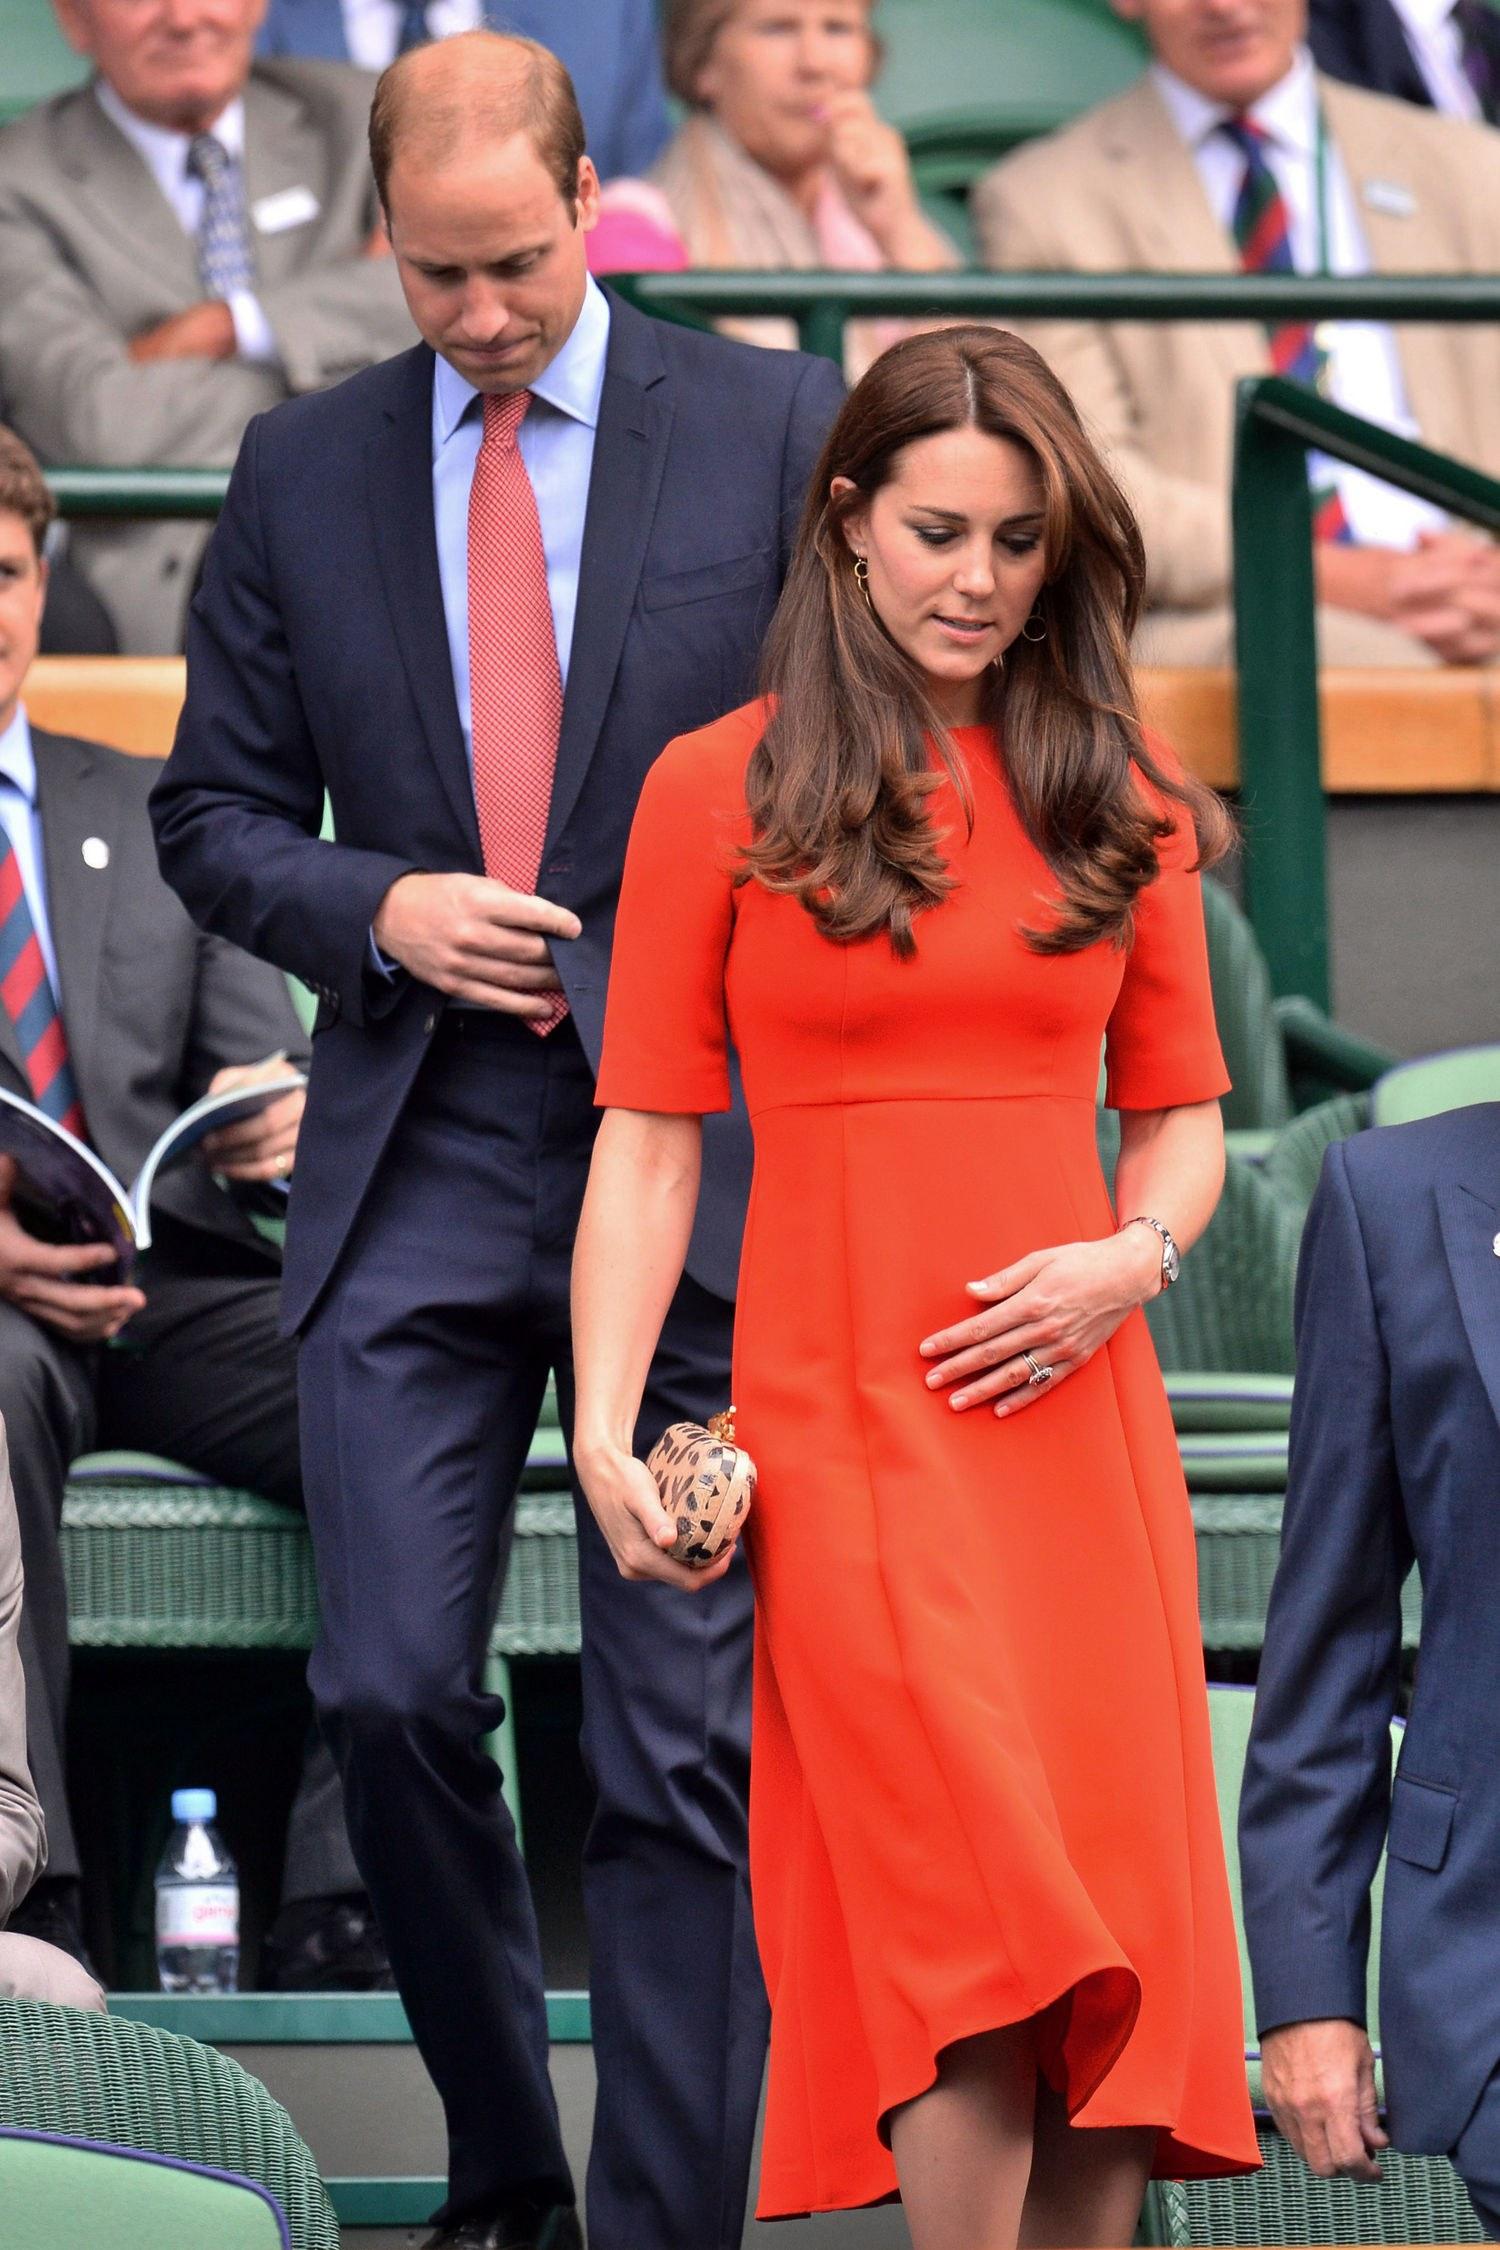 fashion-2015-07-kate-middleton-red-dress-wimbledon-2015-main.jpg